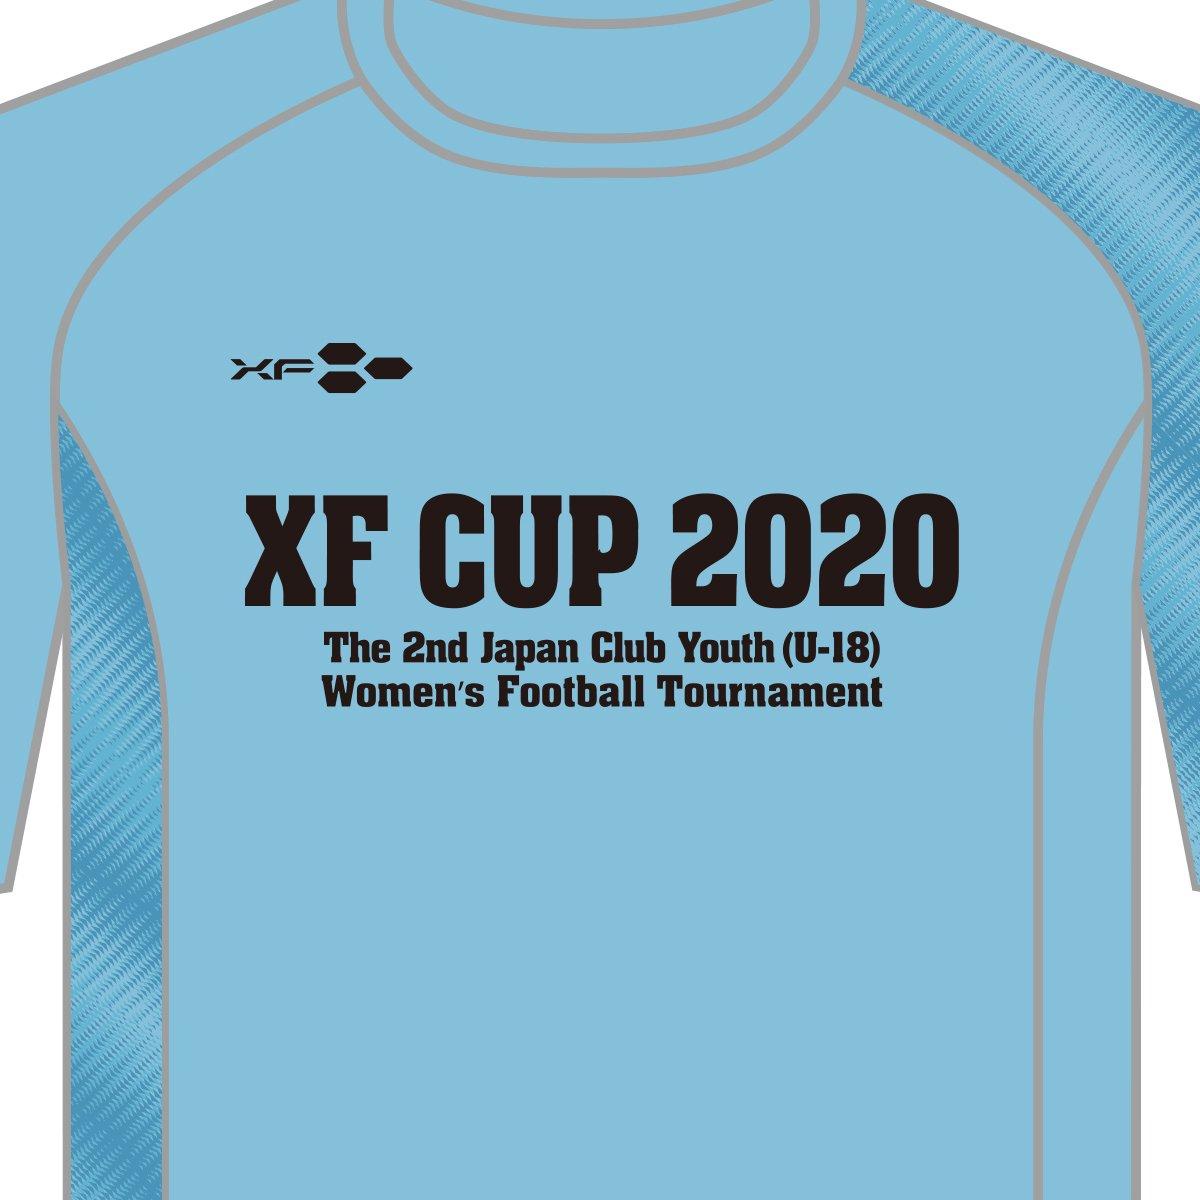 XF CUP 2020 第2回 日本クラブユース女子サッカー大会(U-18)オフィシャル記念Tシャツ サックス